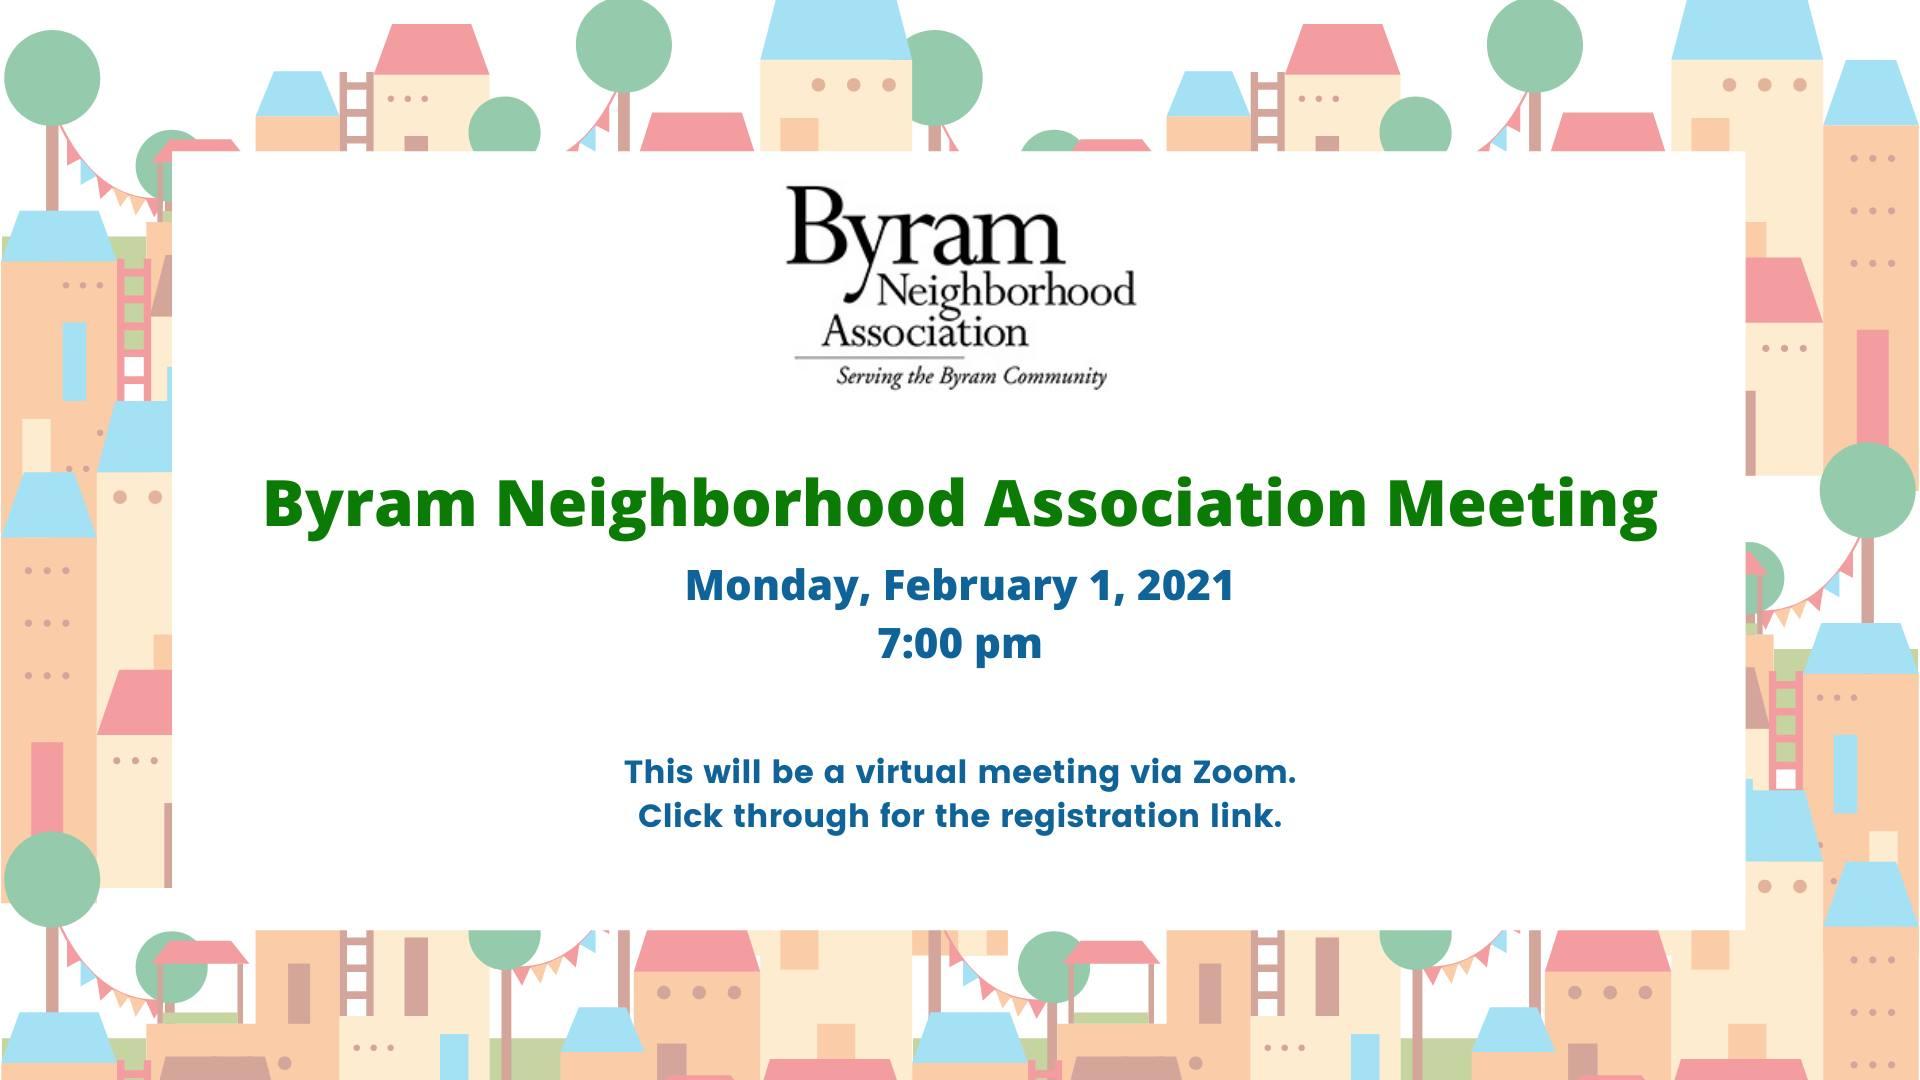 Byram Neighborhood Association Meeting